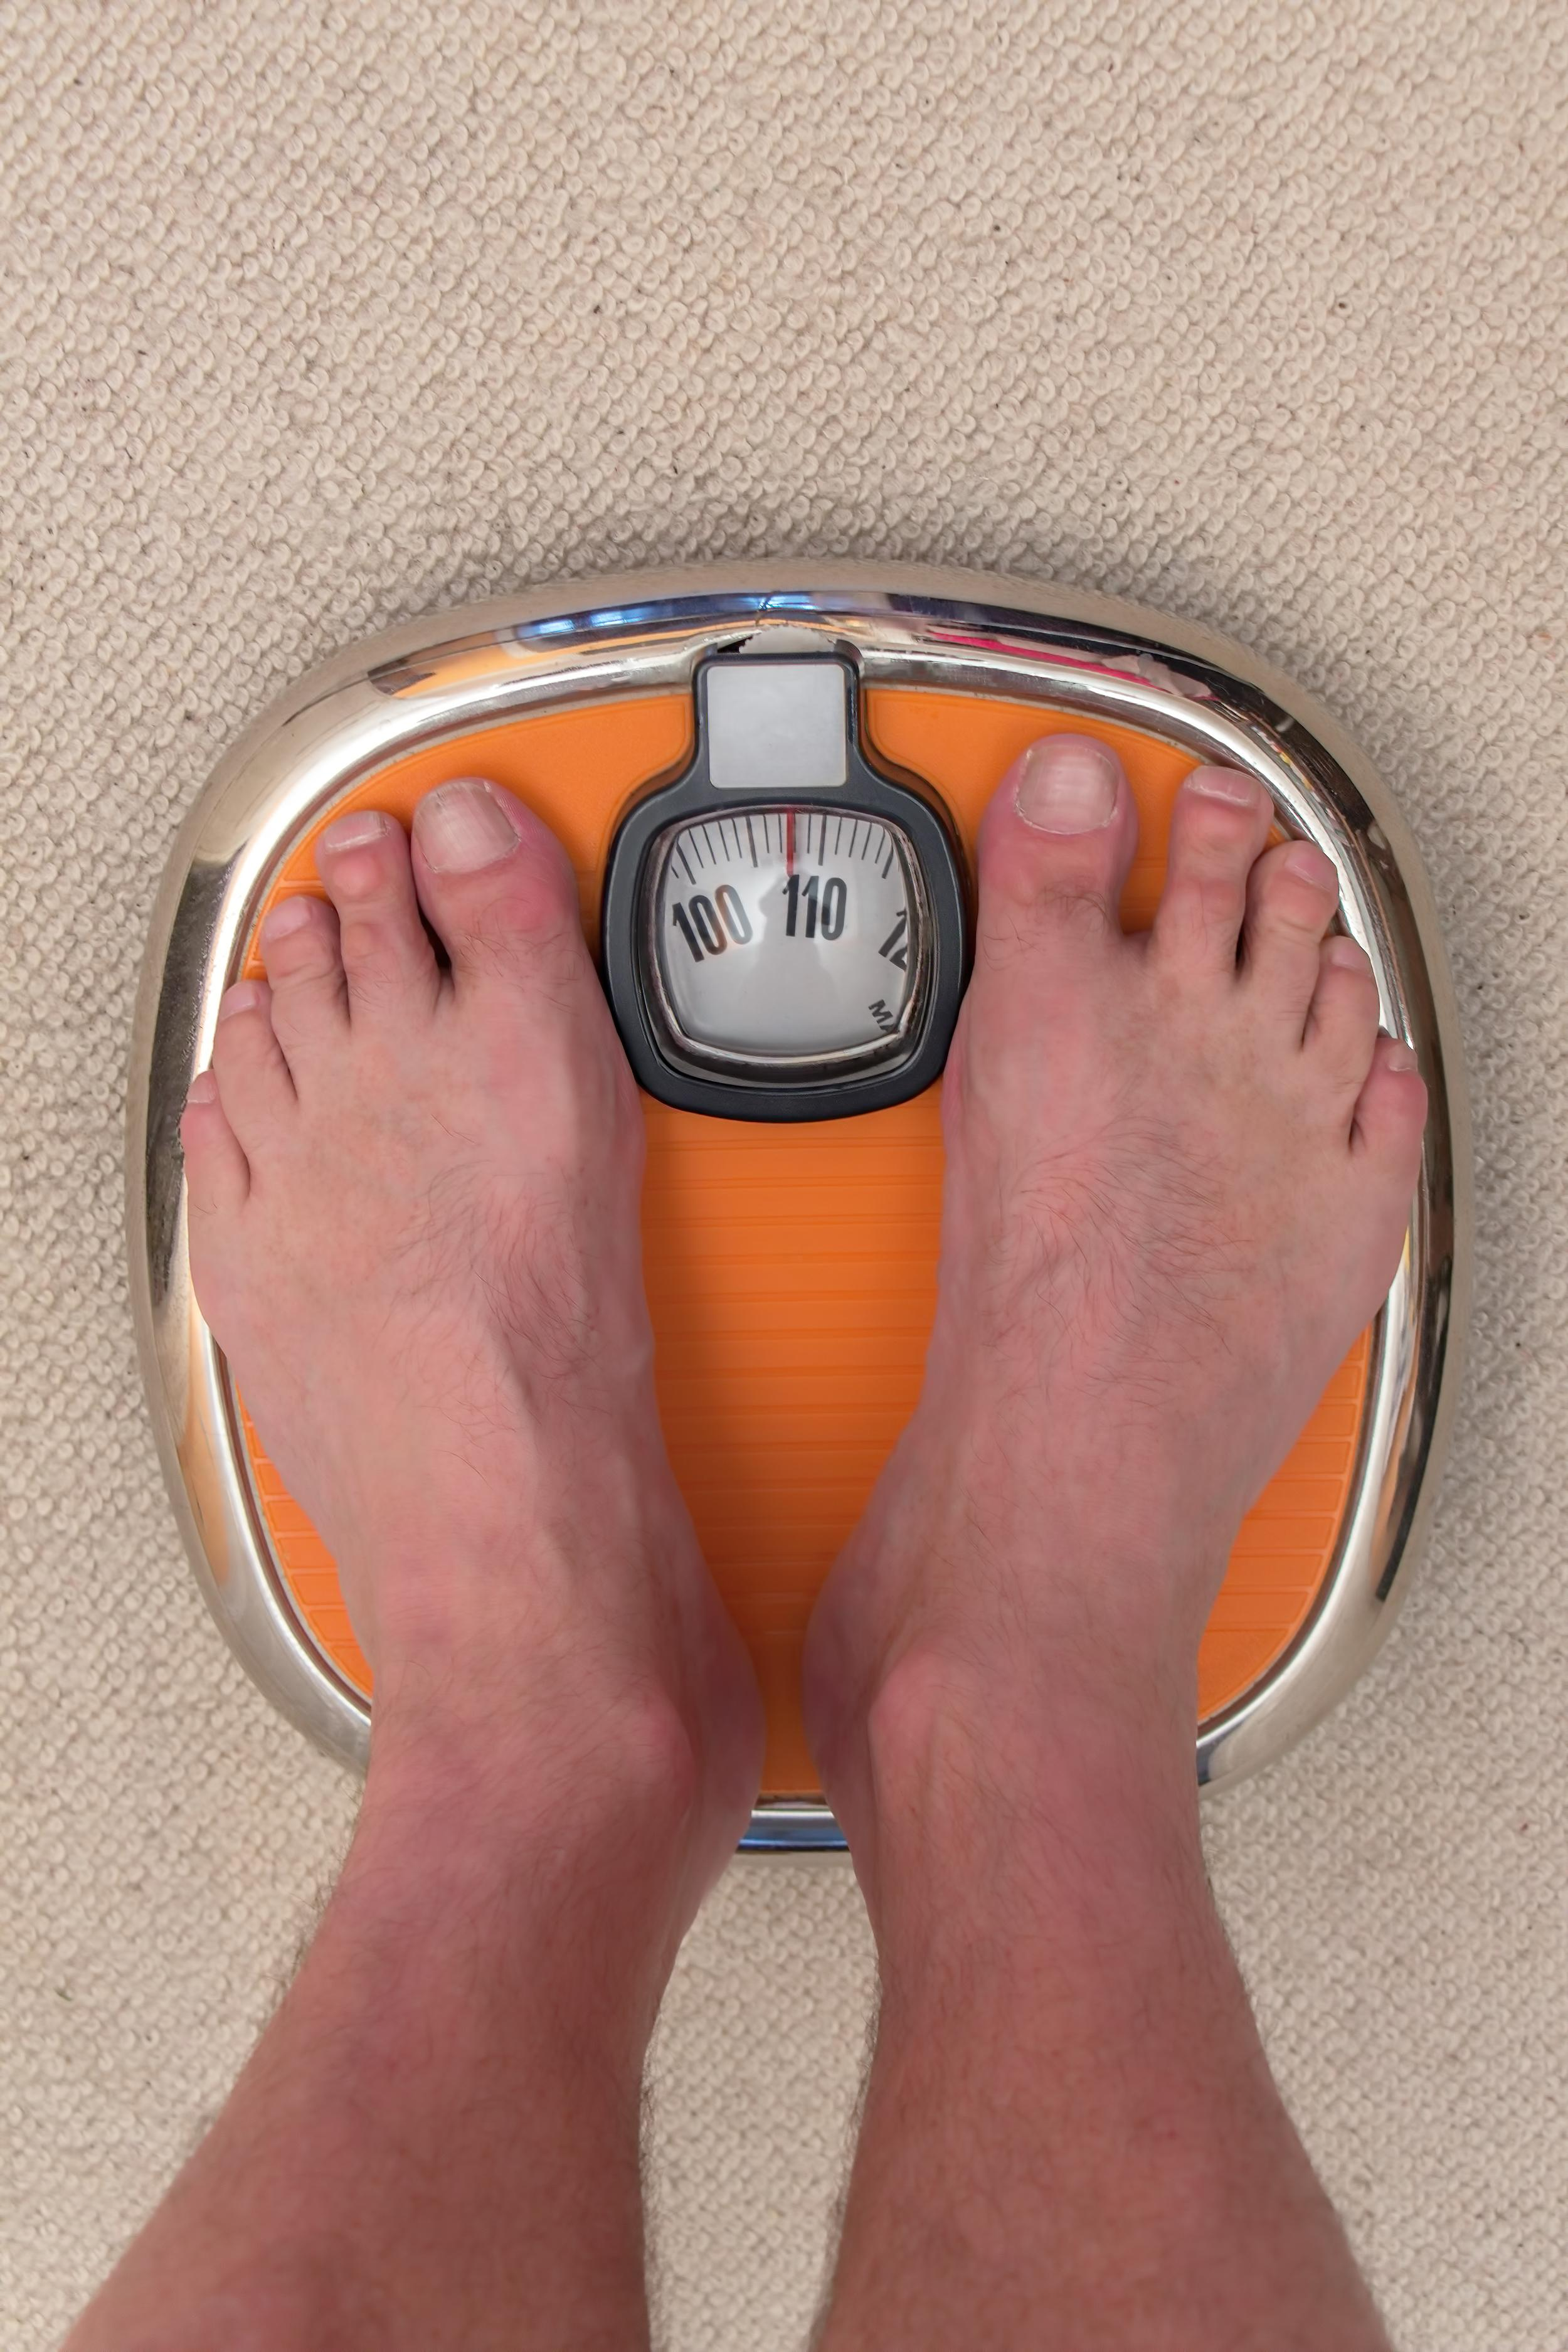 Obezitatea – cauze psihologice | Cabinet de psihologie - Ramona-Paula Axenti